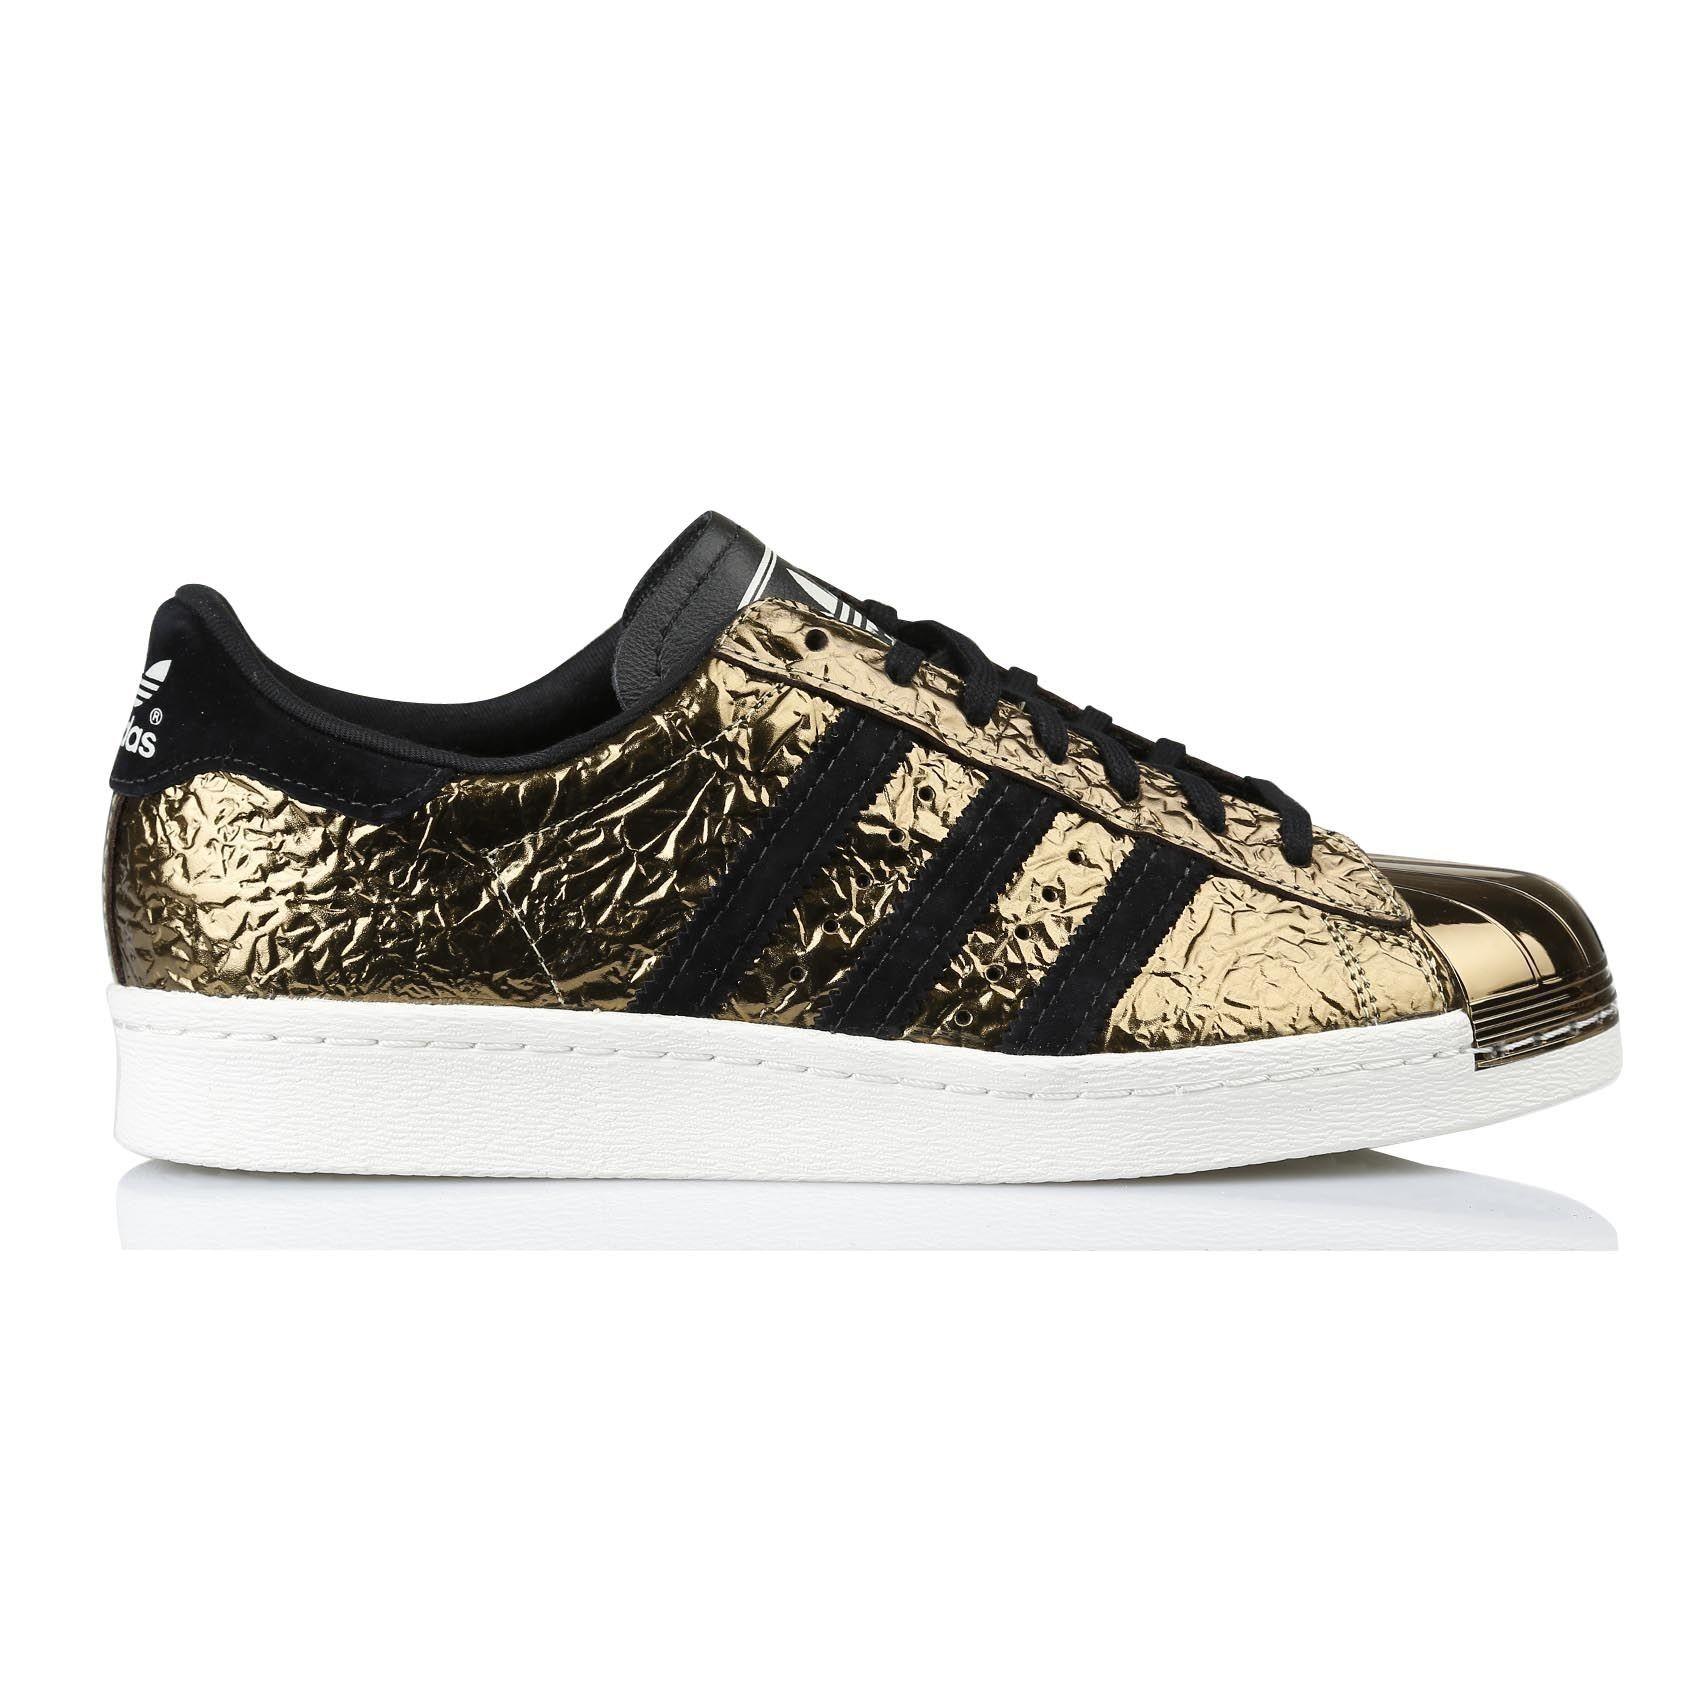 adidas superstar femme or et noir